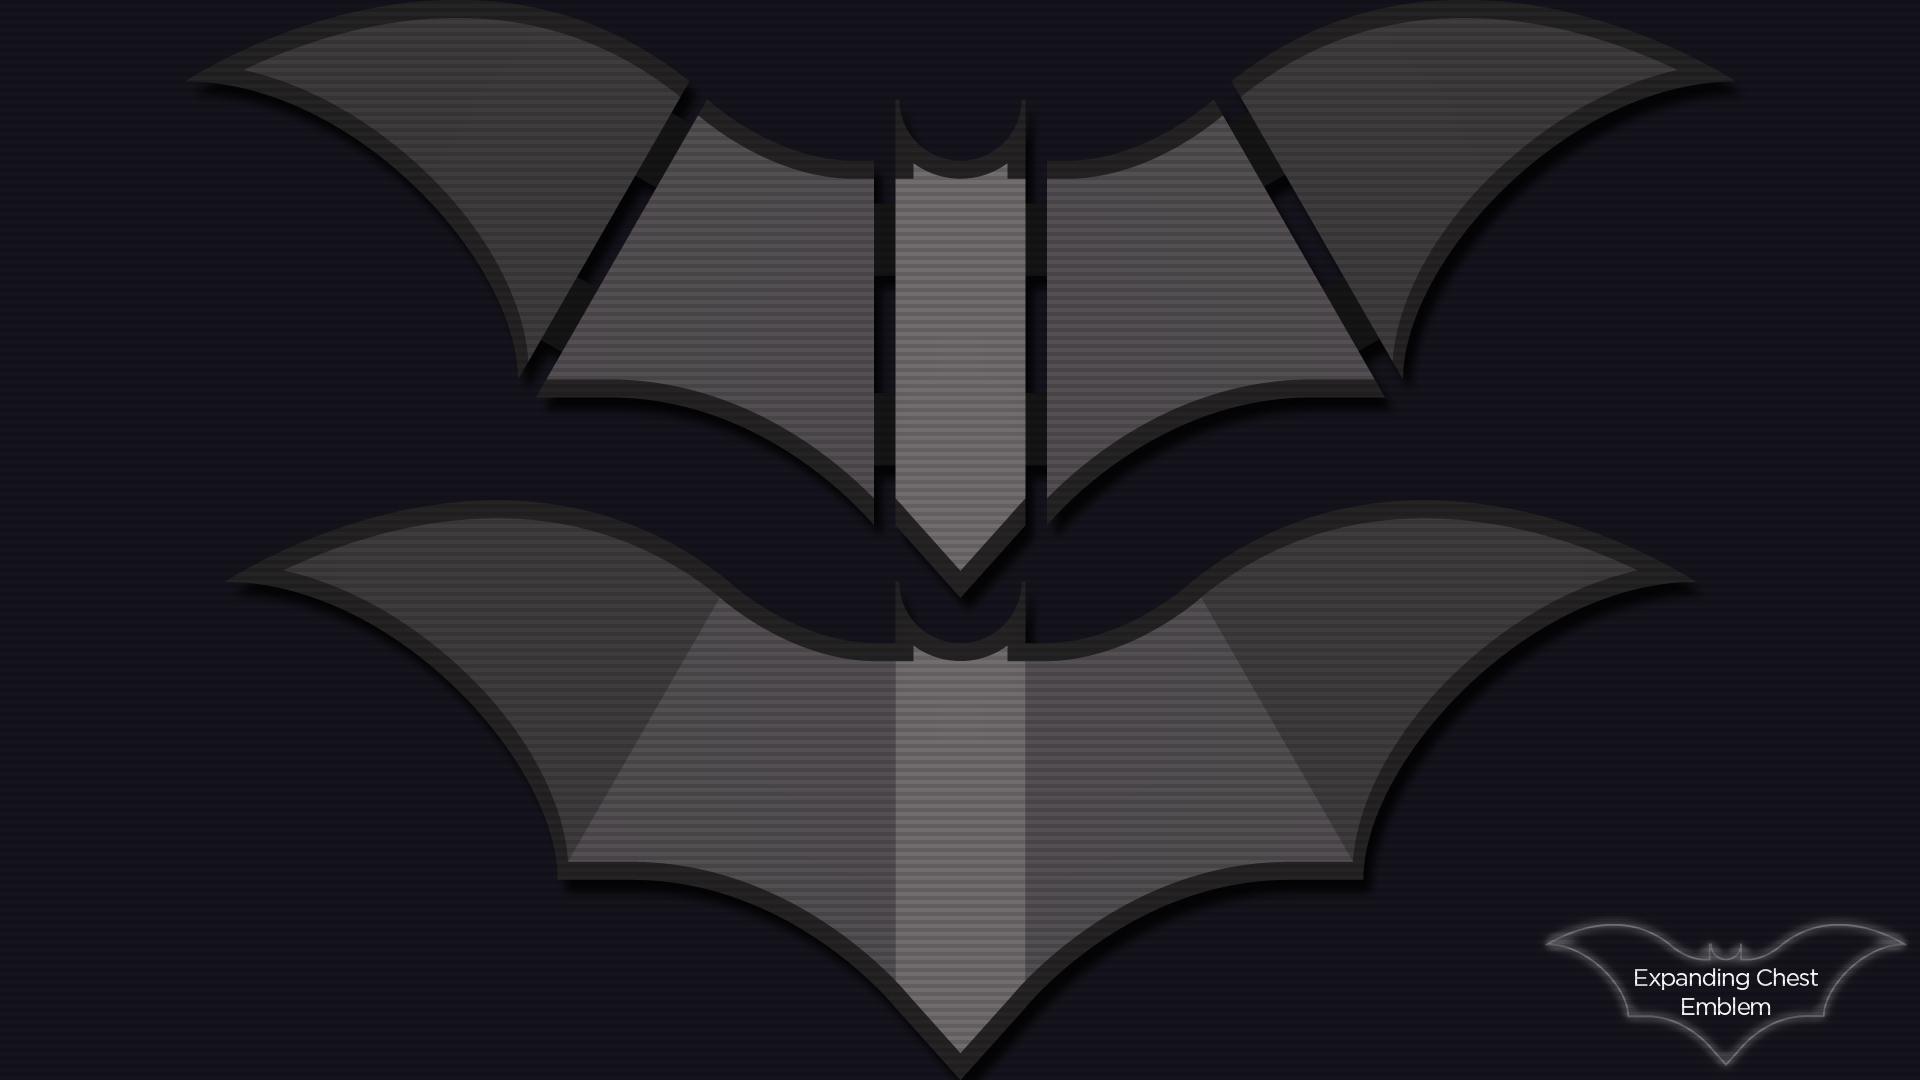 Batman Chest Emblem Luxury Batman Expanding Chest Emblem by Itsintelligentdesign On